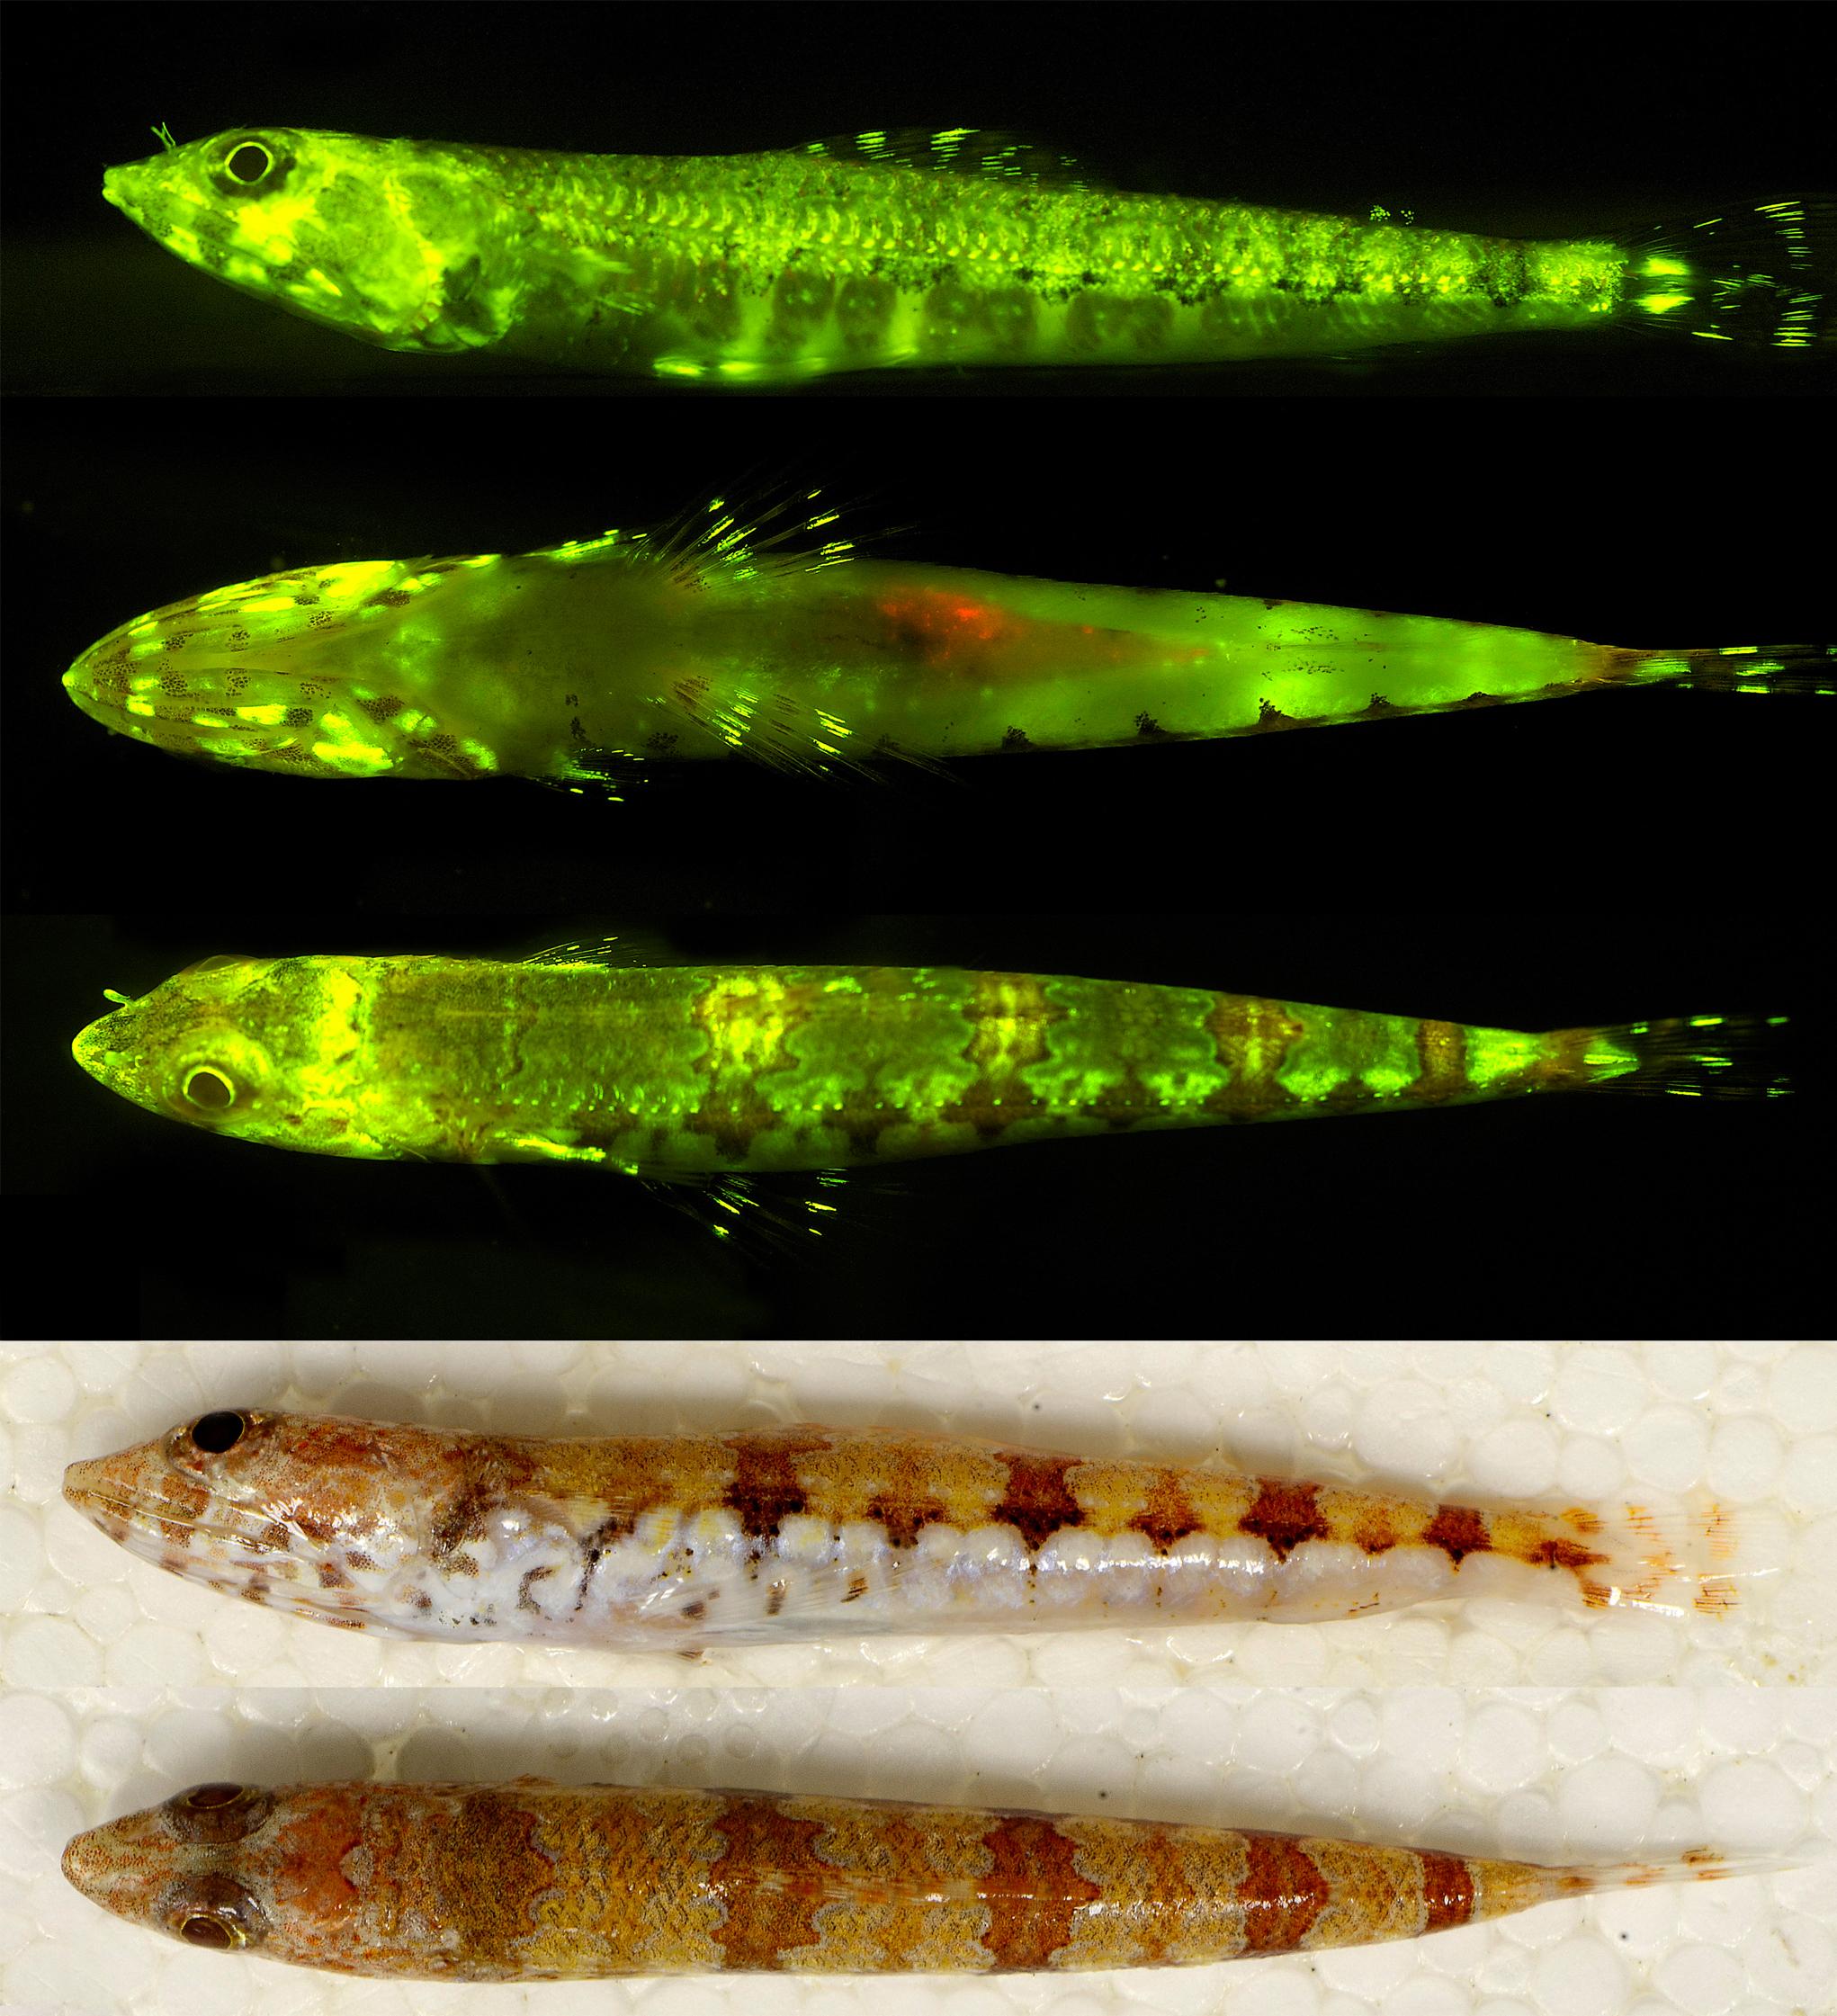 Synodus_Biofluorescence